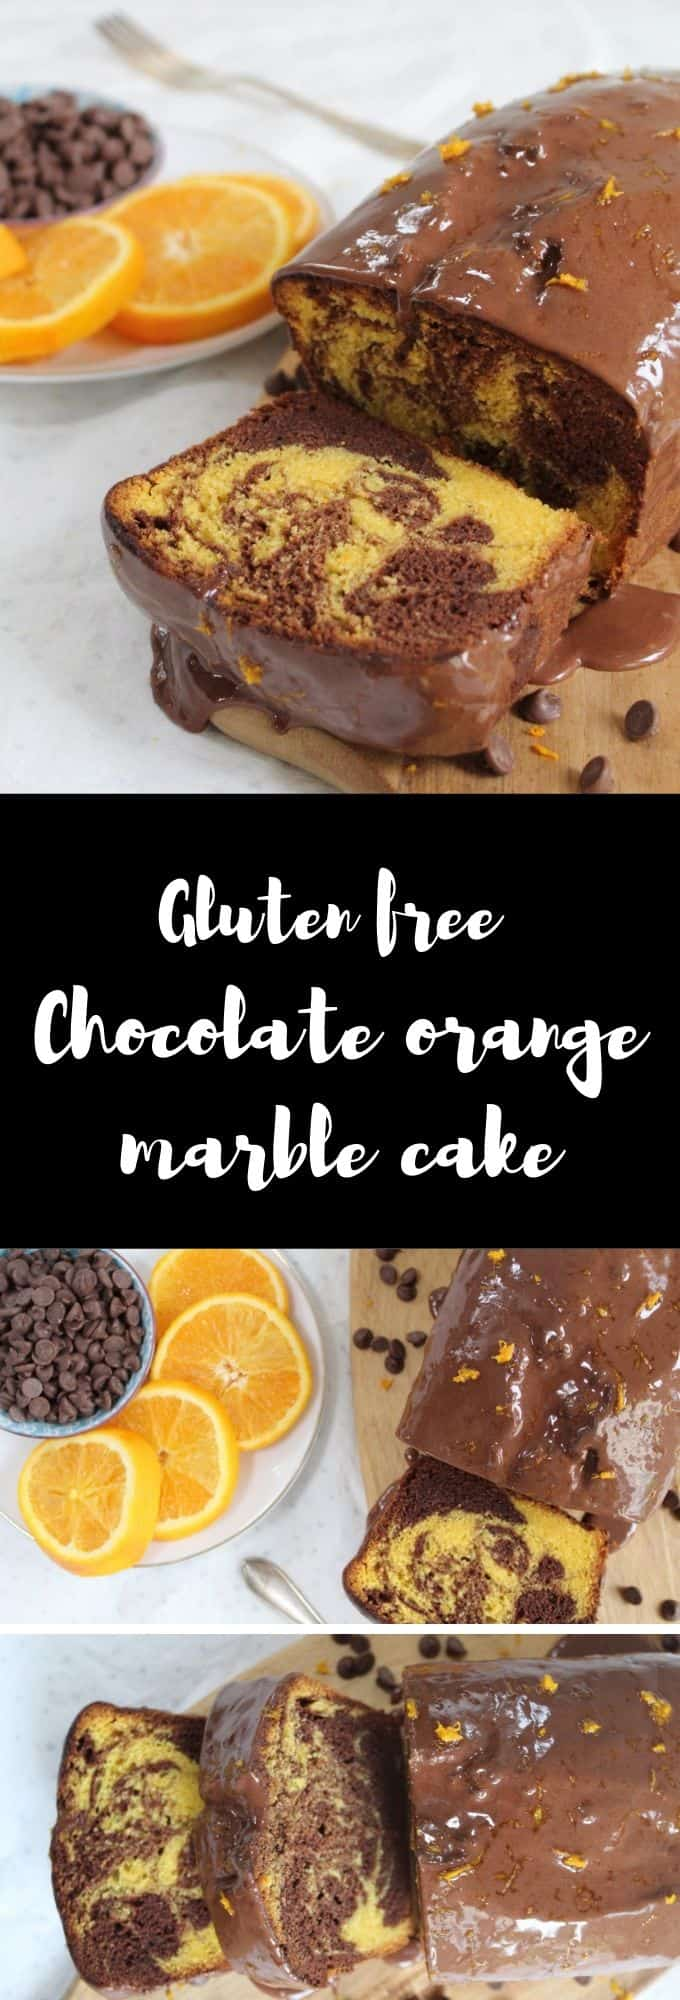 gluten free chocolate orange marble cake recipe coeliac celiac easy bake